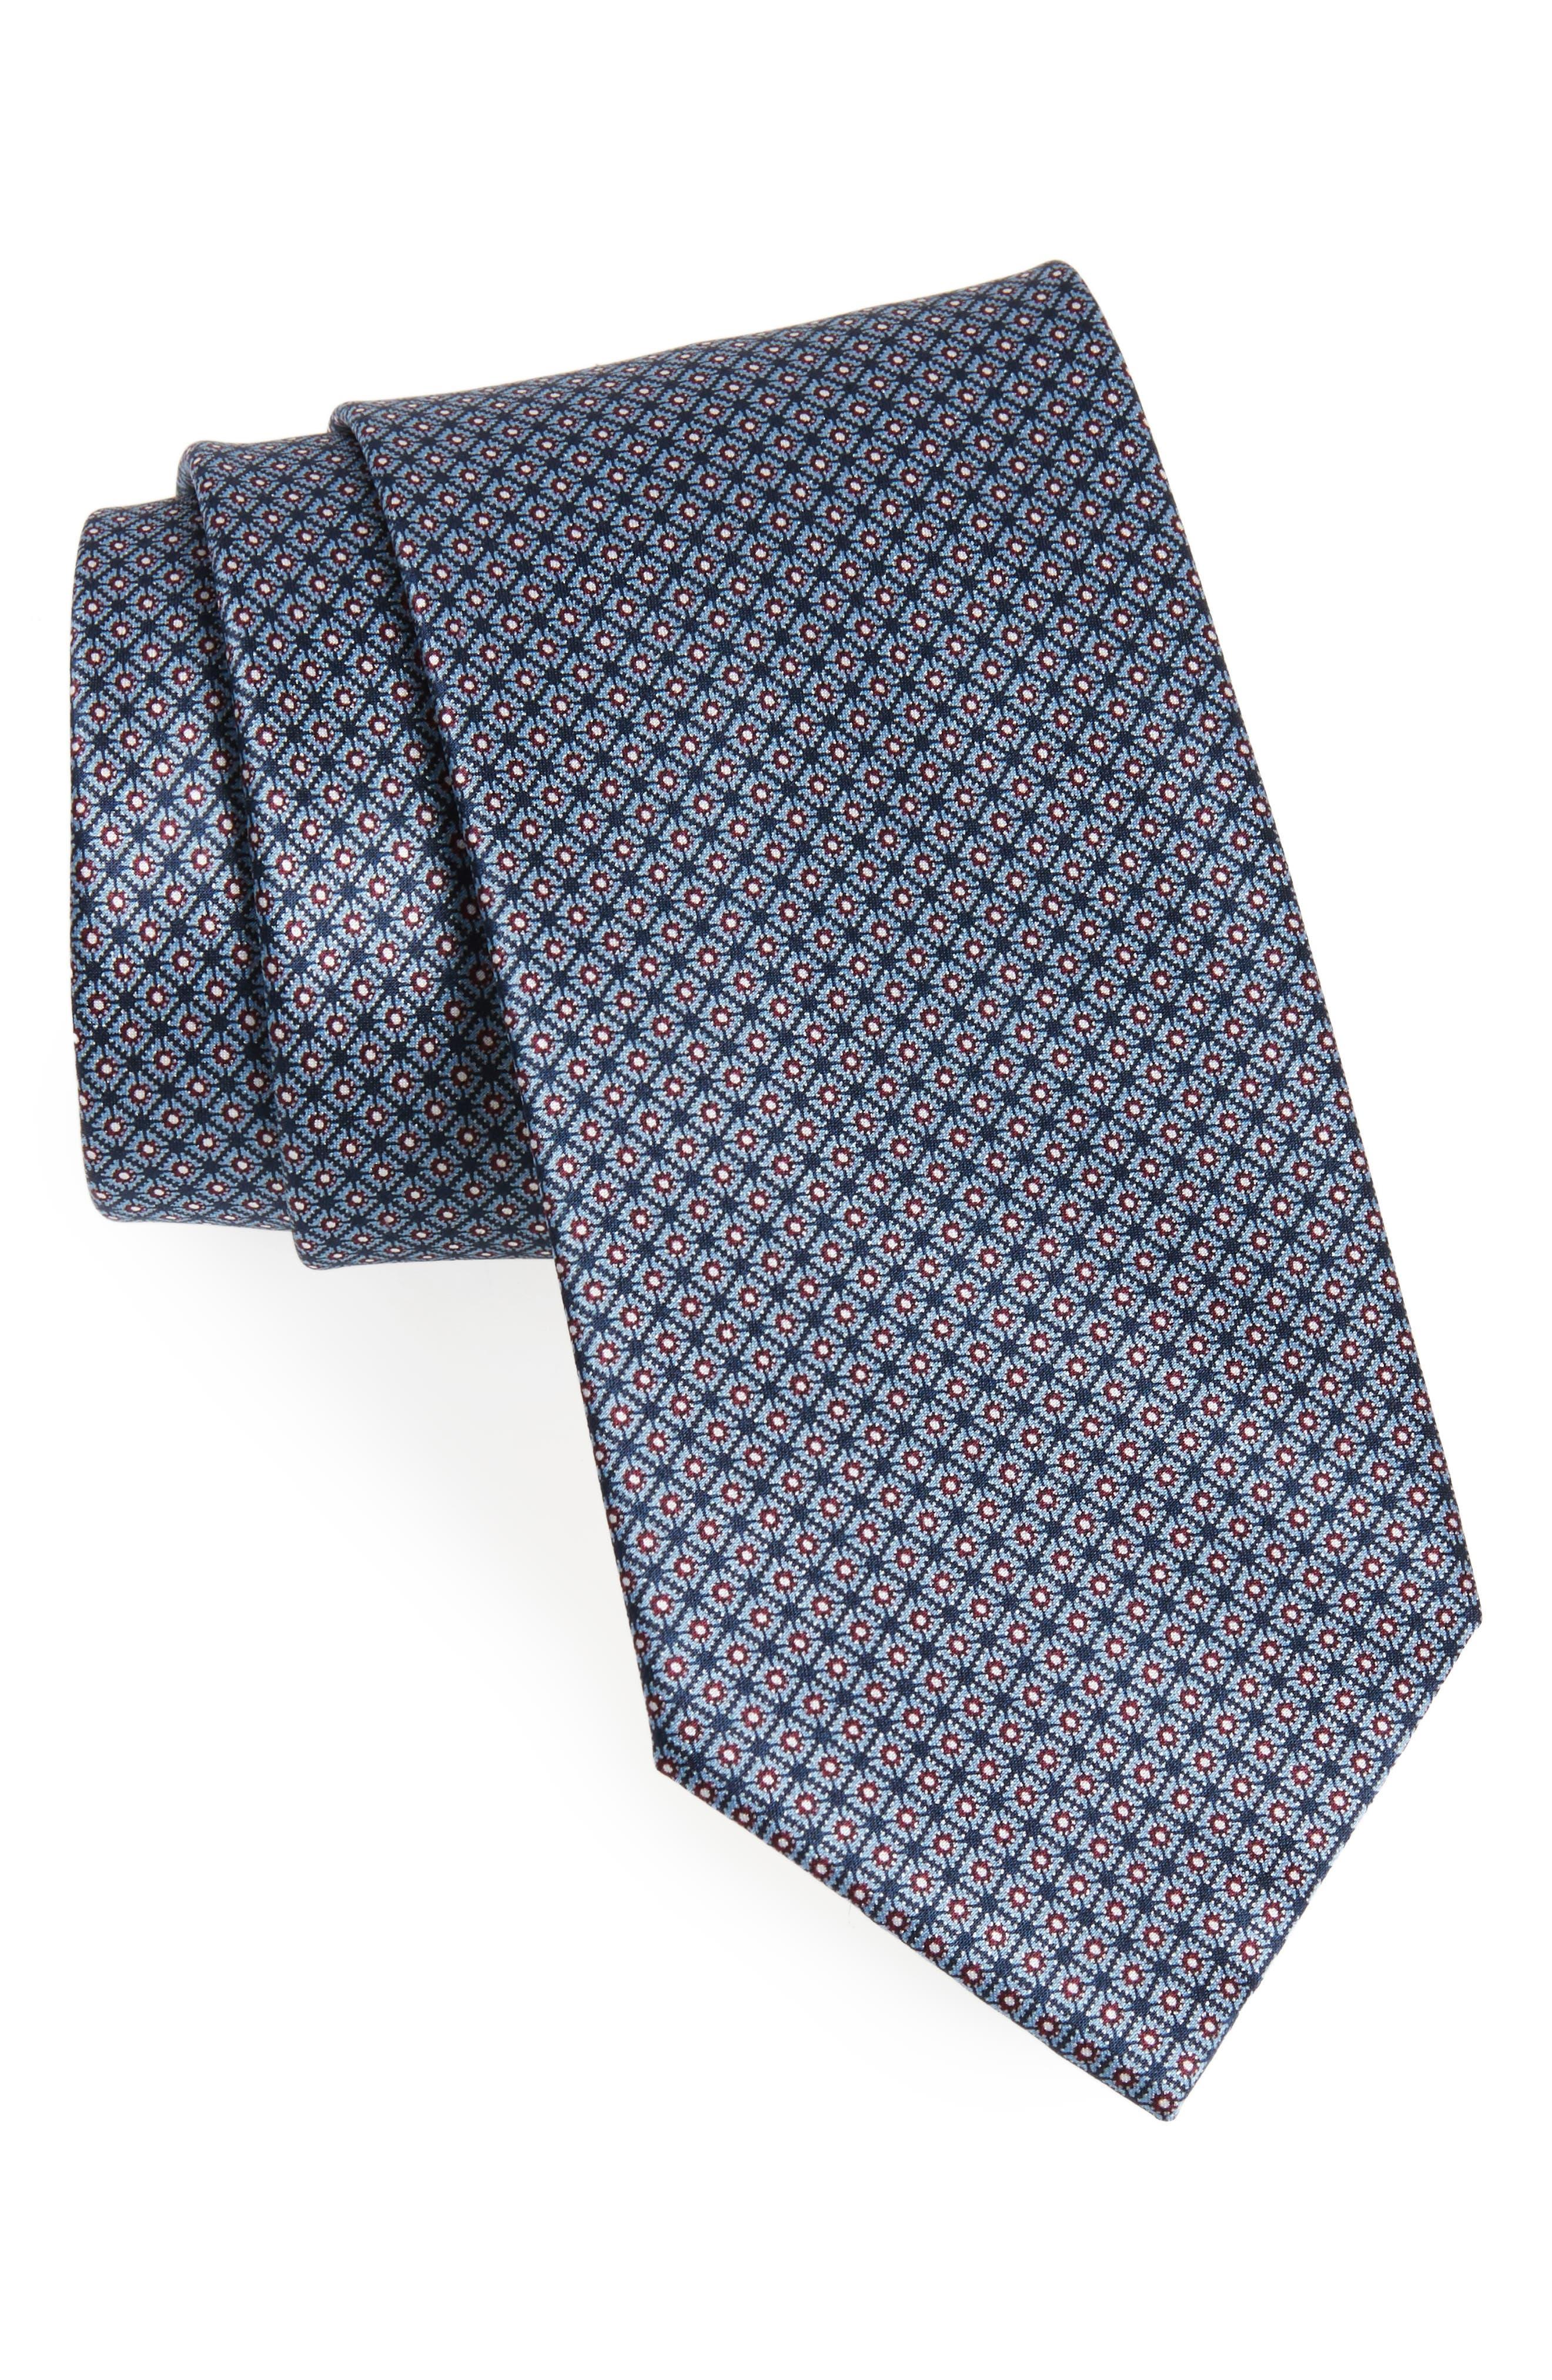 Neat Silk Tie,                         Main,                         color, 490